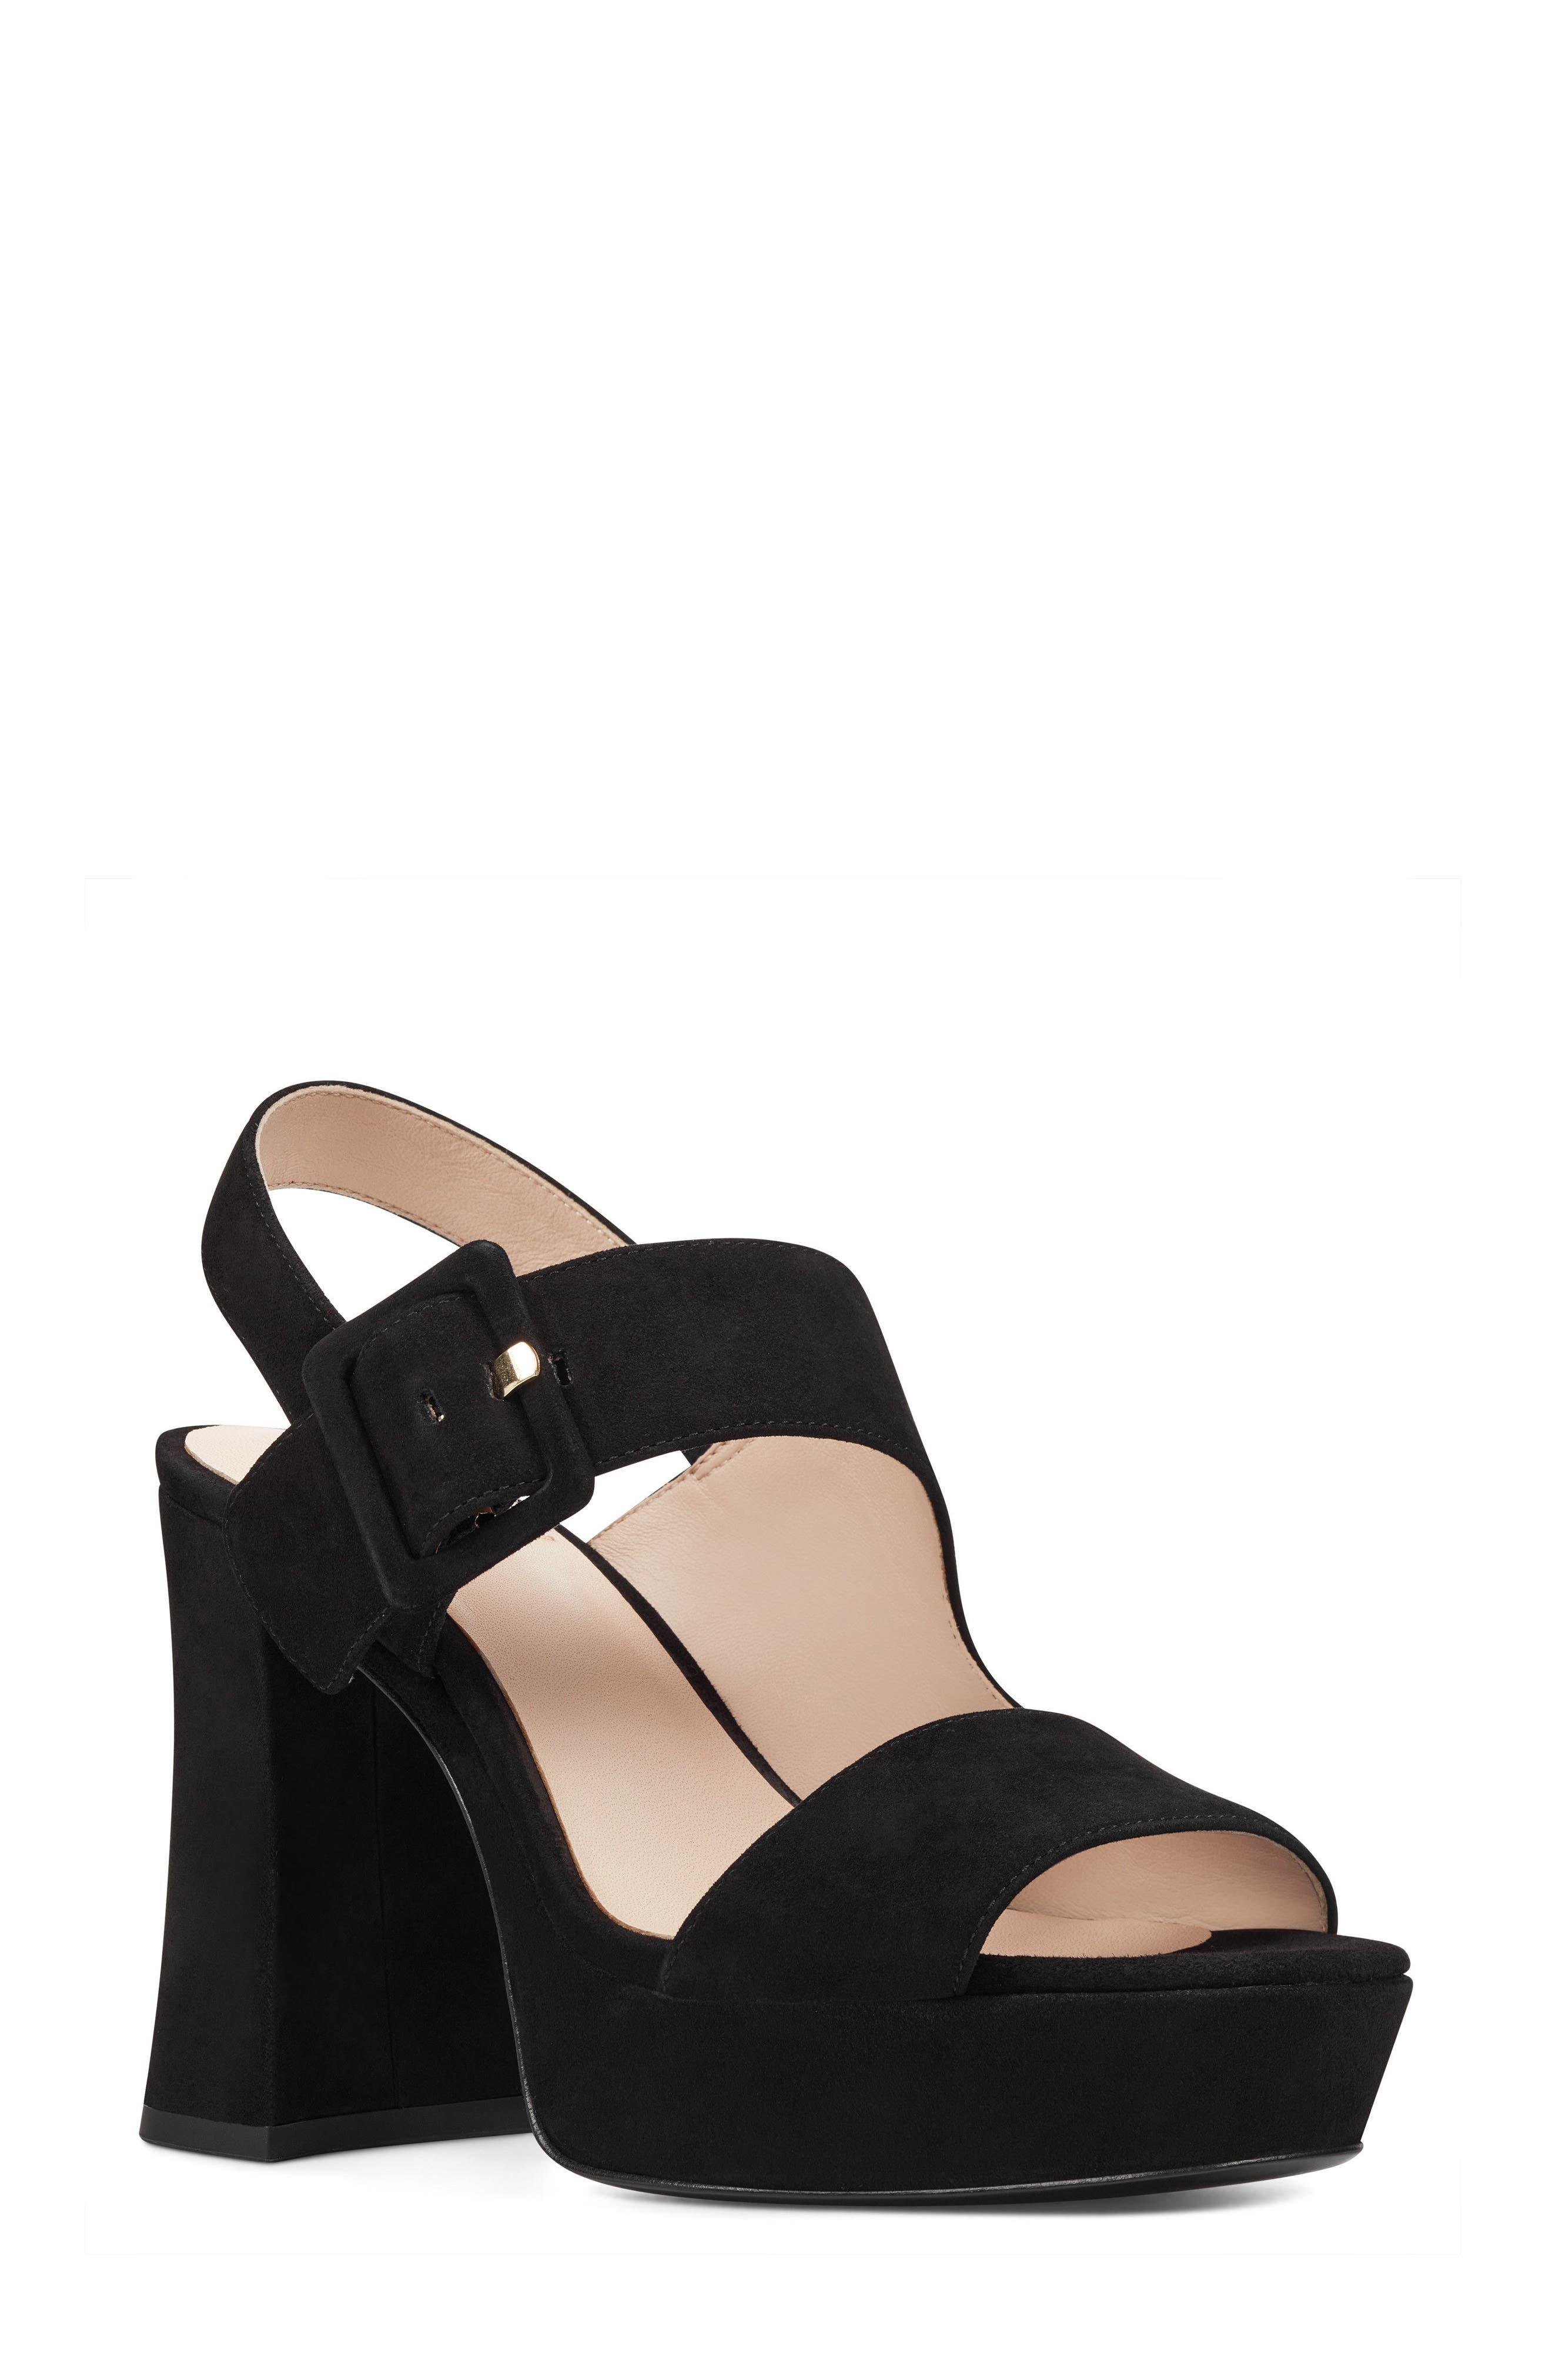 Lexine - 40th Anniversary Capsule Collection Platform Sandal,                             Main thumbnail 1, color,                             BLACK LEATHER